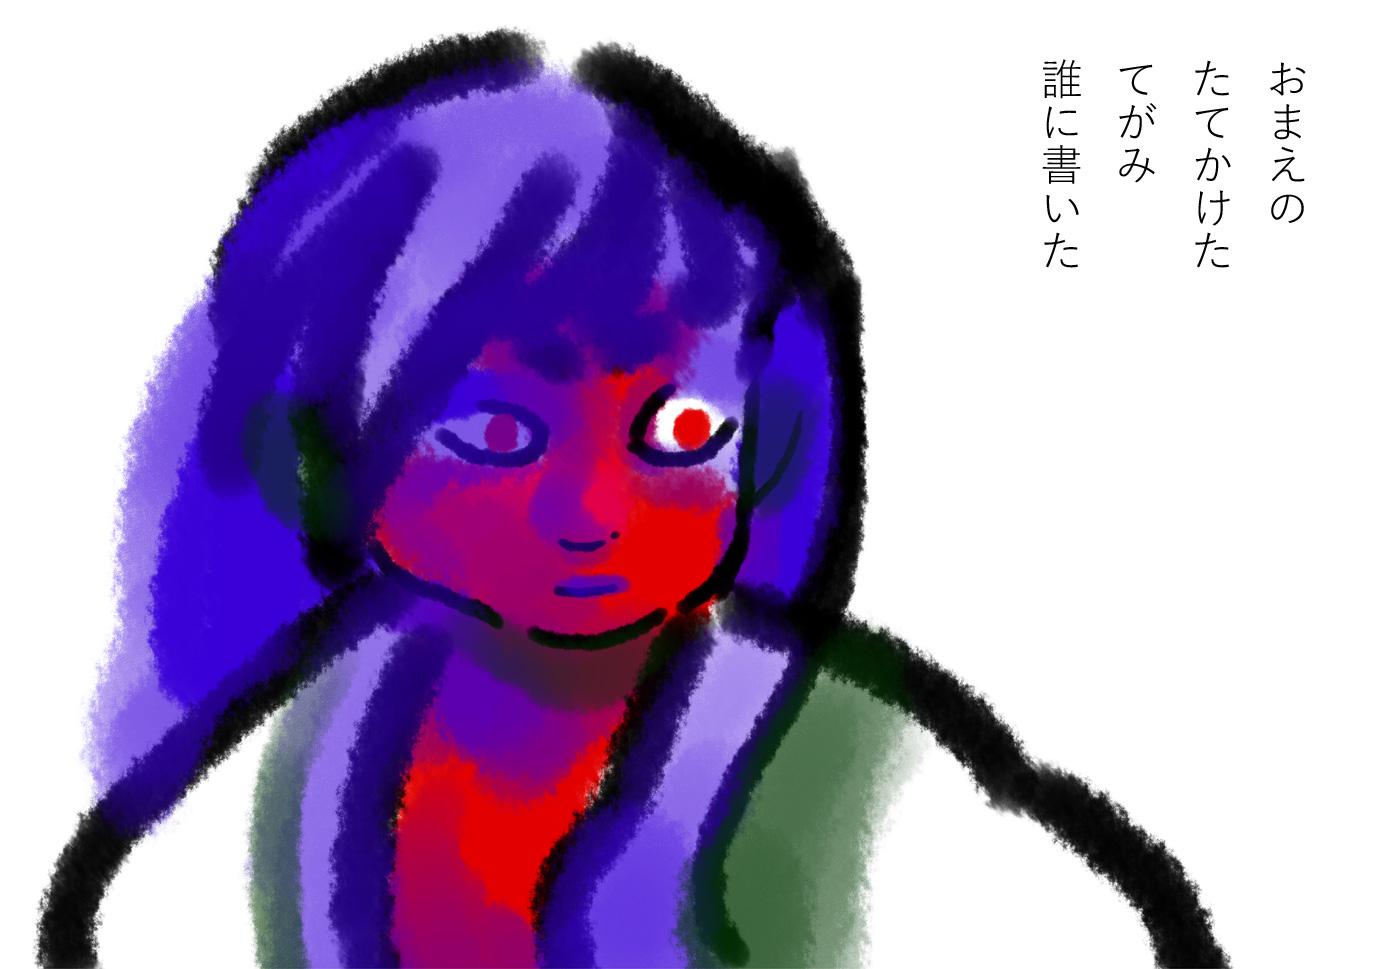 http://ahito.com/comic/ehon/voice/img/2018/20180309_2/01.jpg